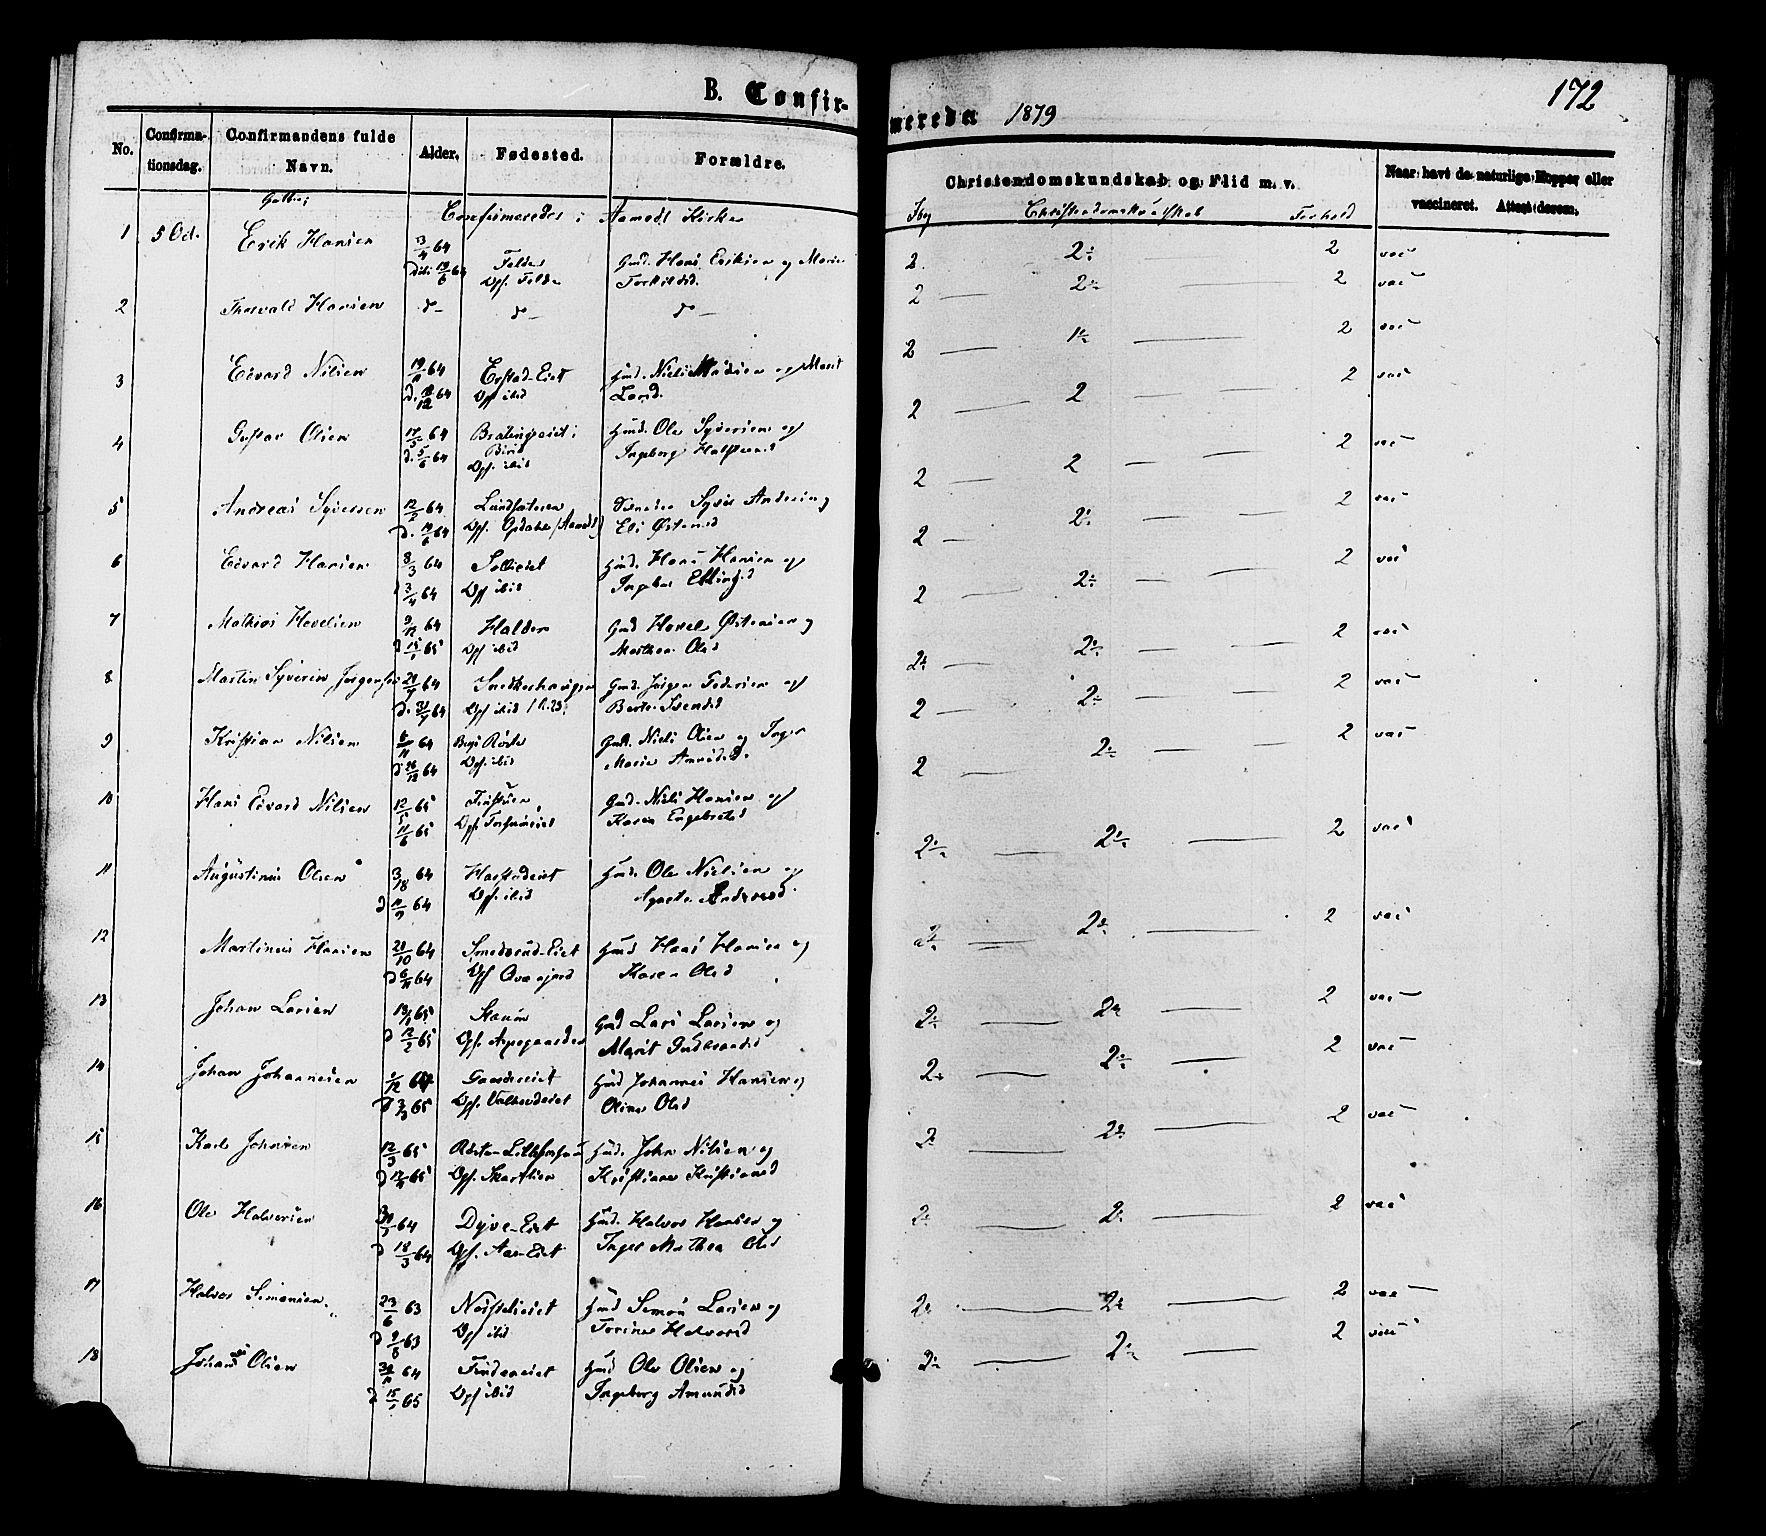 SAH, Nordre Land prestekontor, Ministerialbok nr. 2, 1872-1881, s. 172